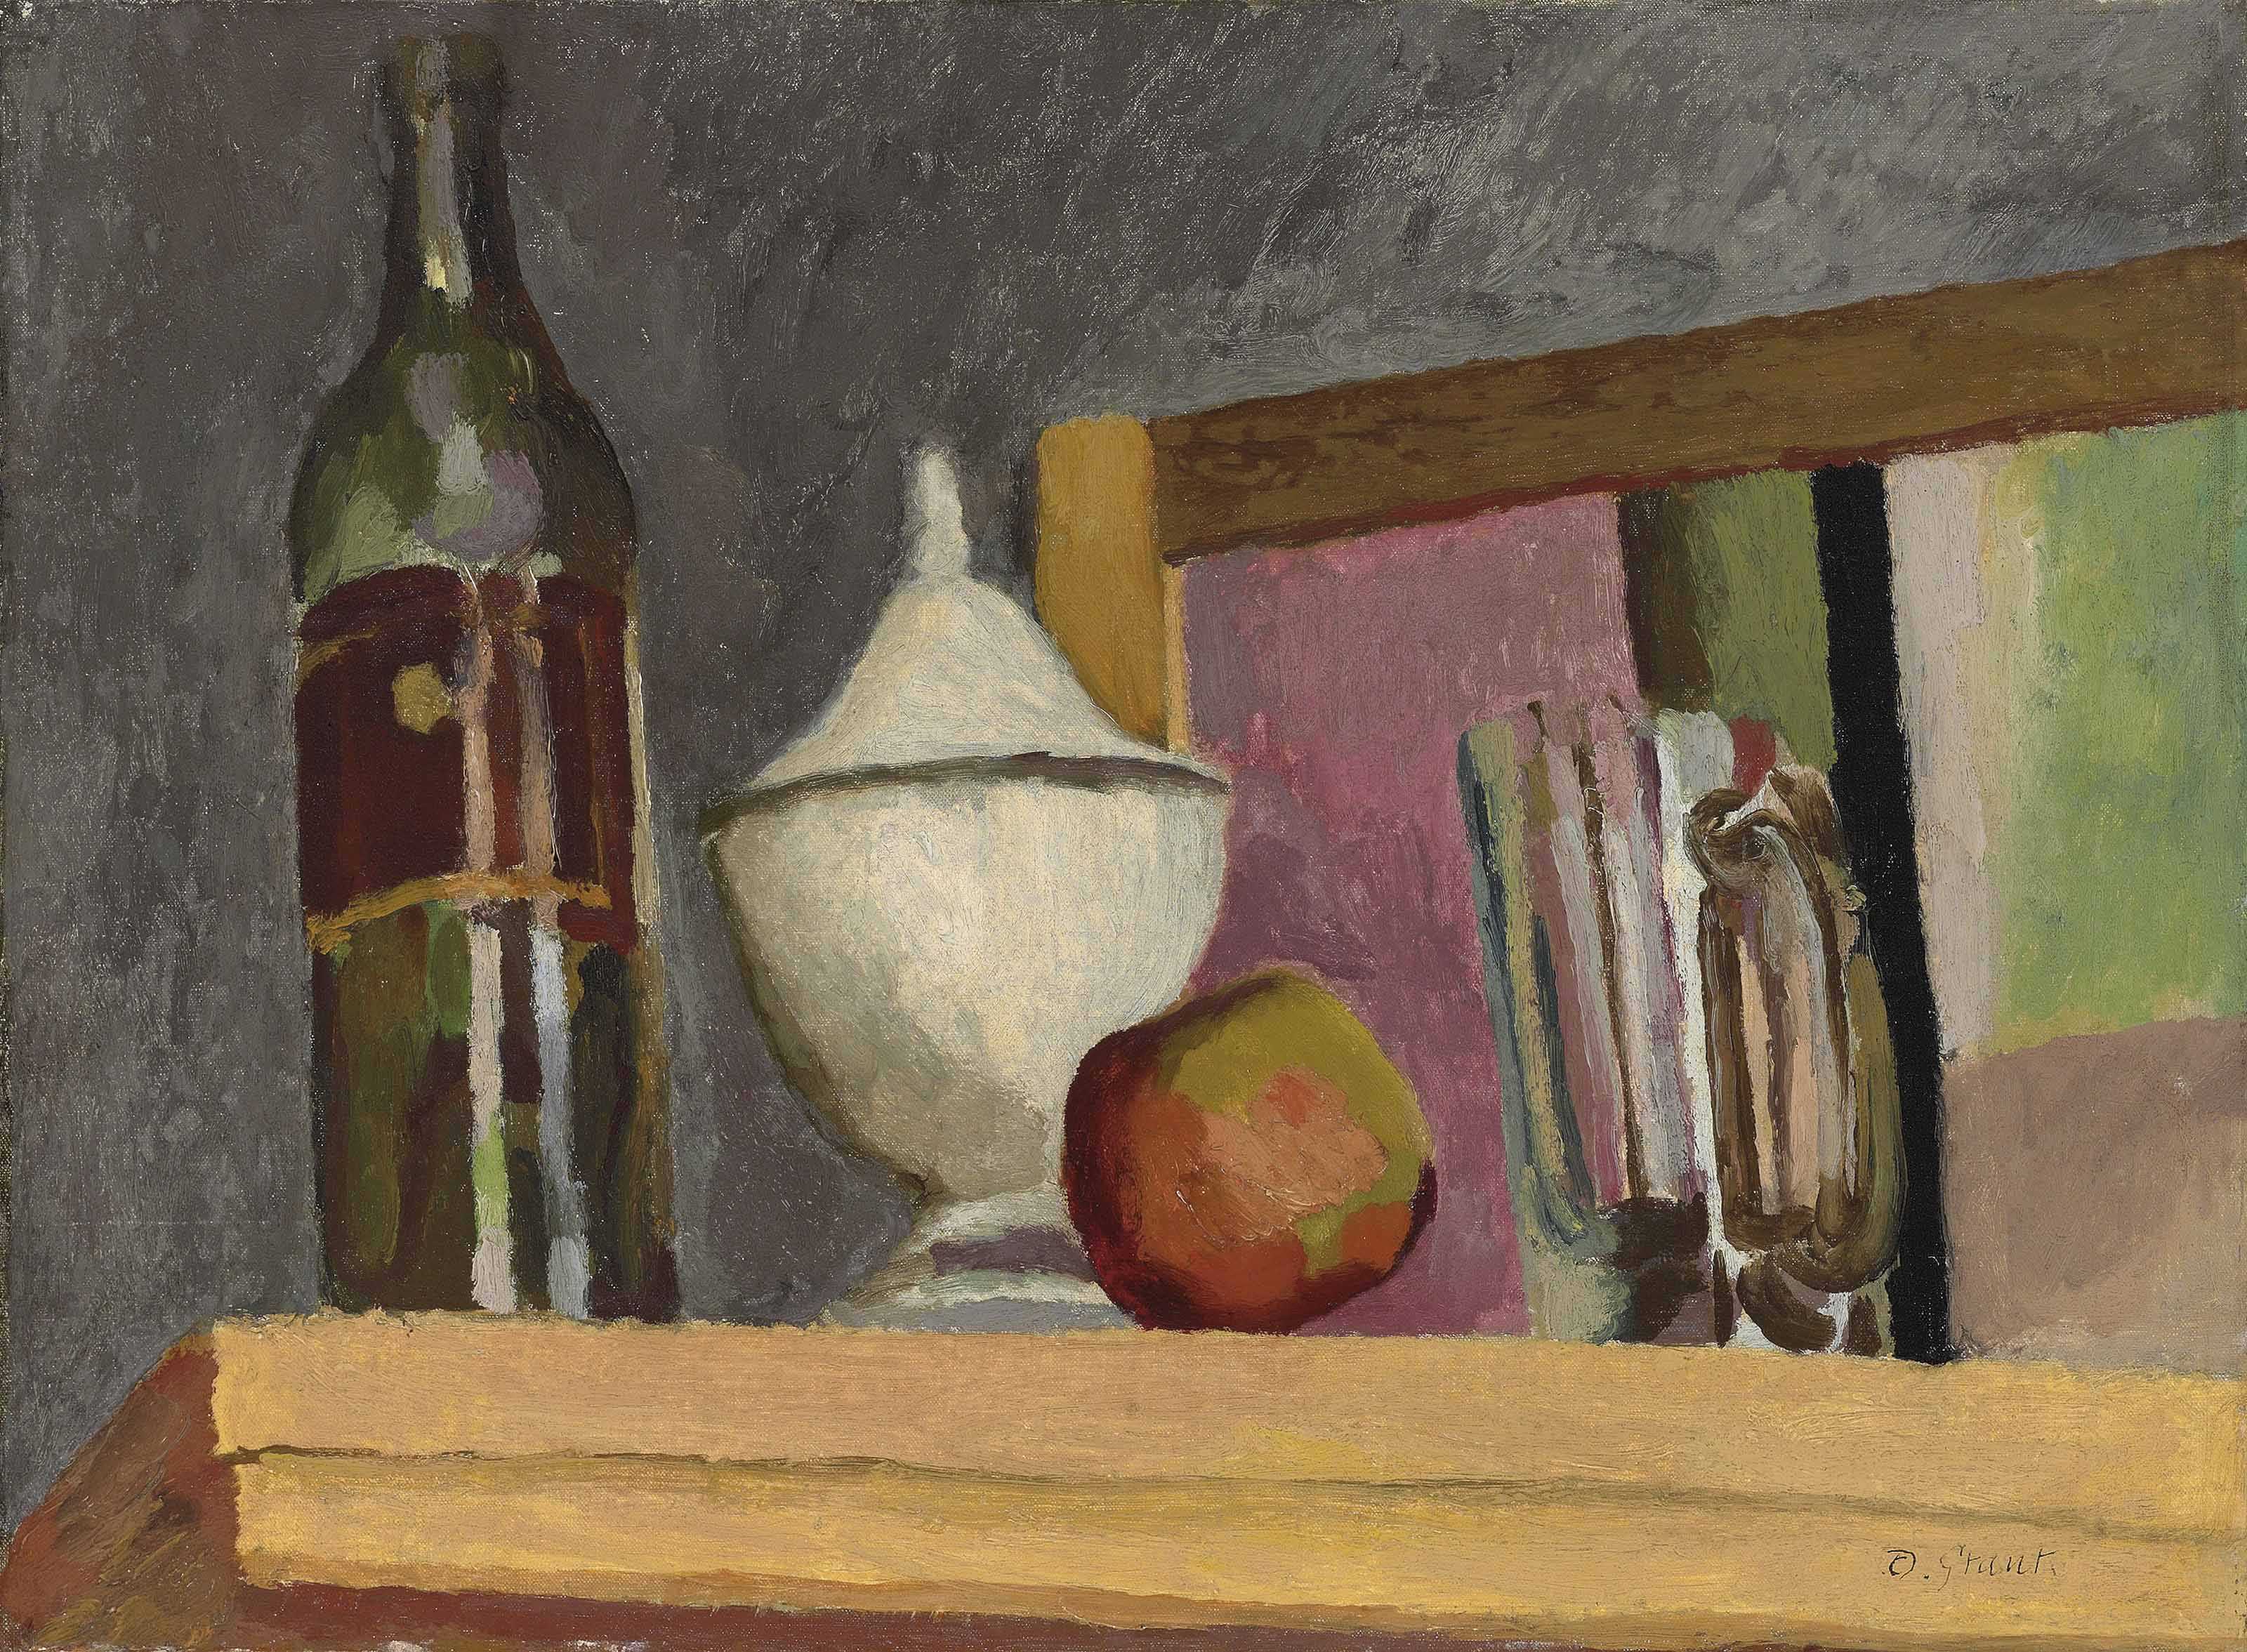 Still Life of Bottle, Apple and Jar